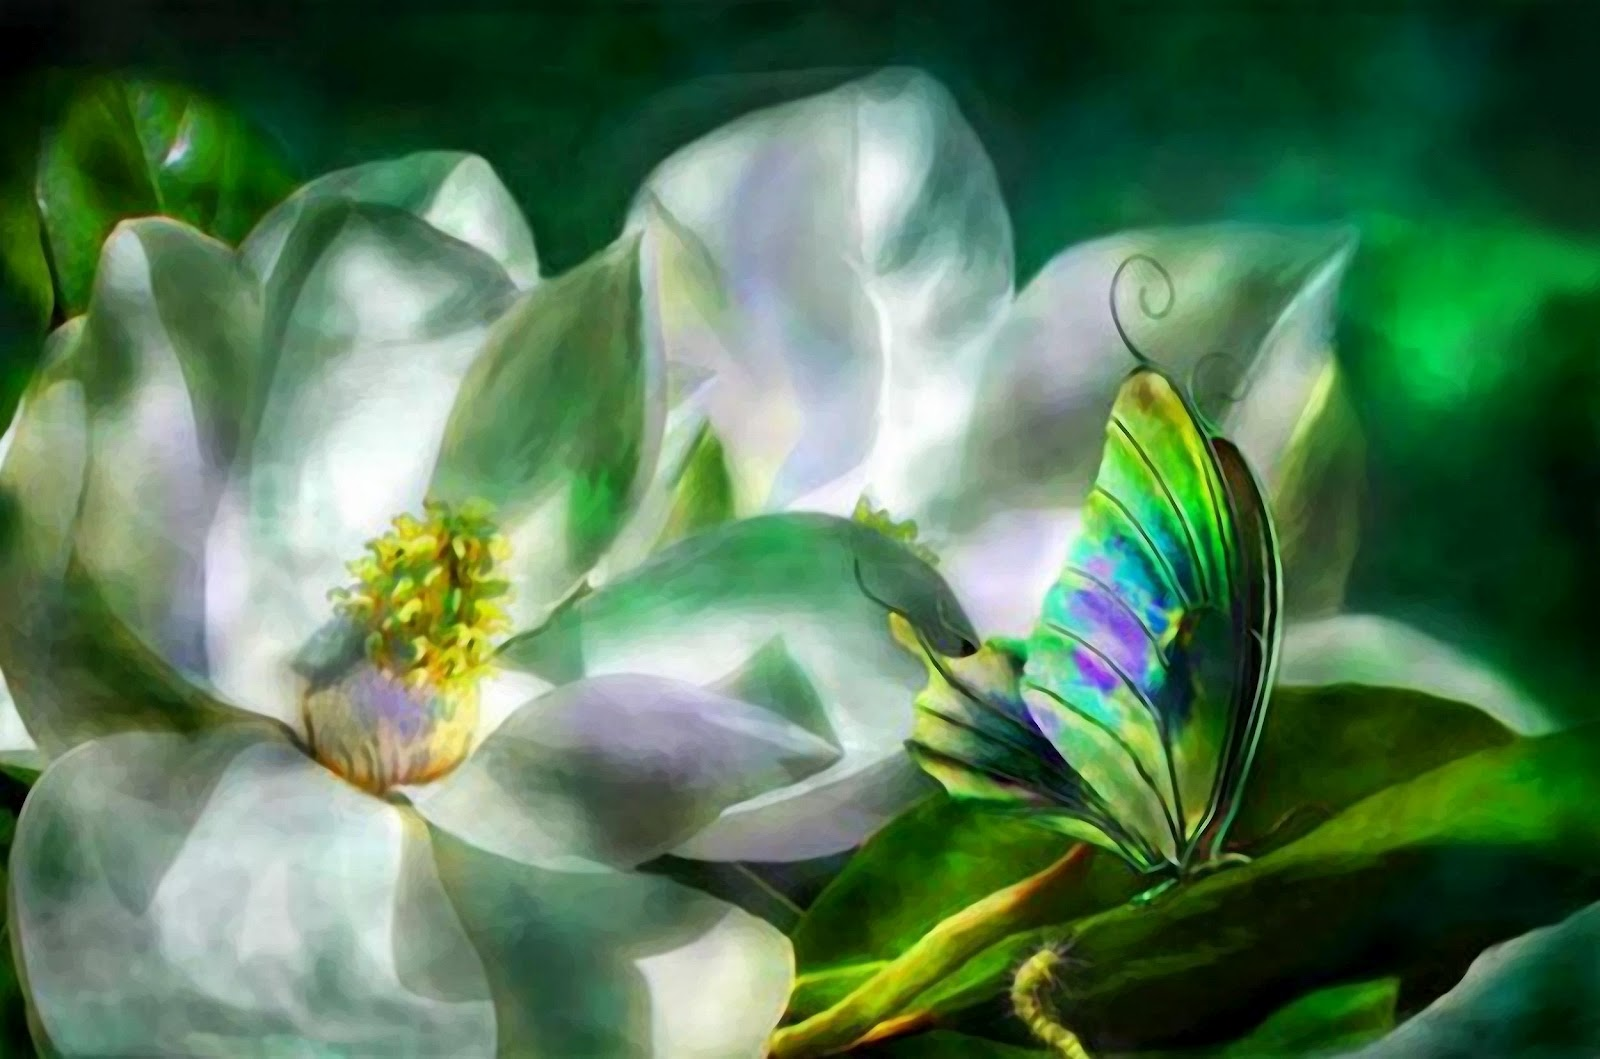 Exquisitas flores de Carol Cavalaris - Arte en Taringa!